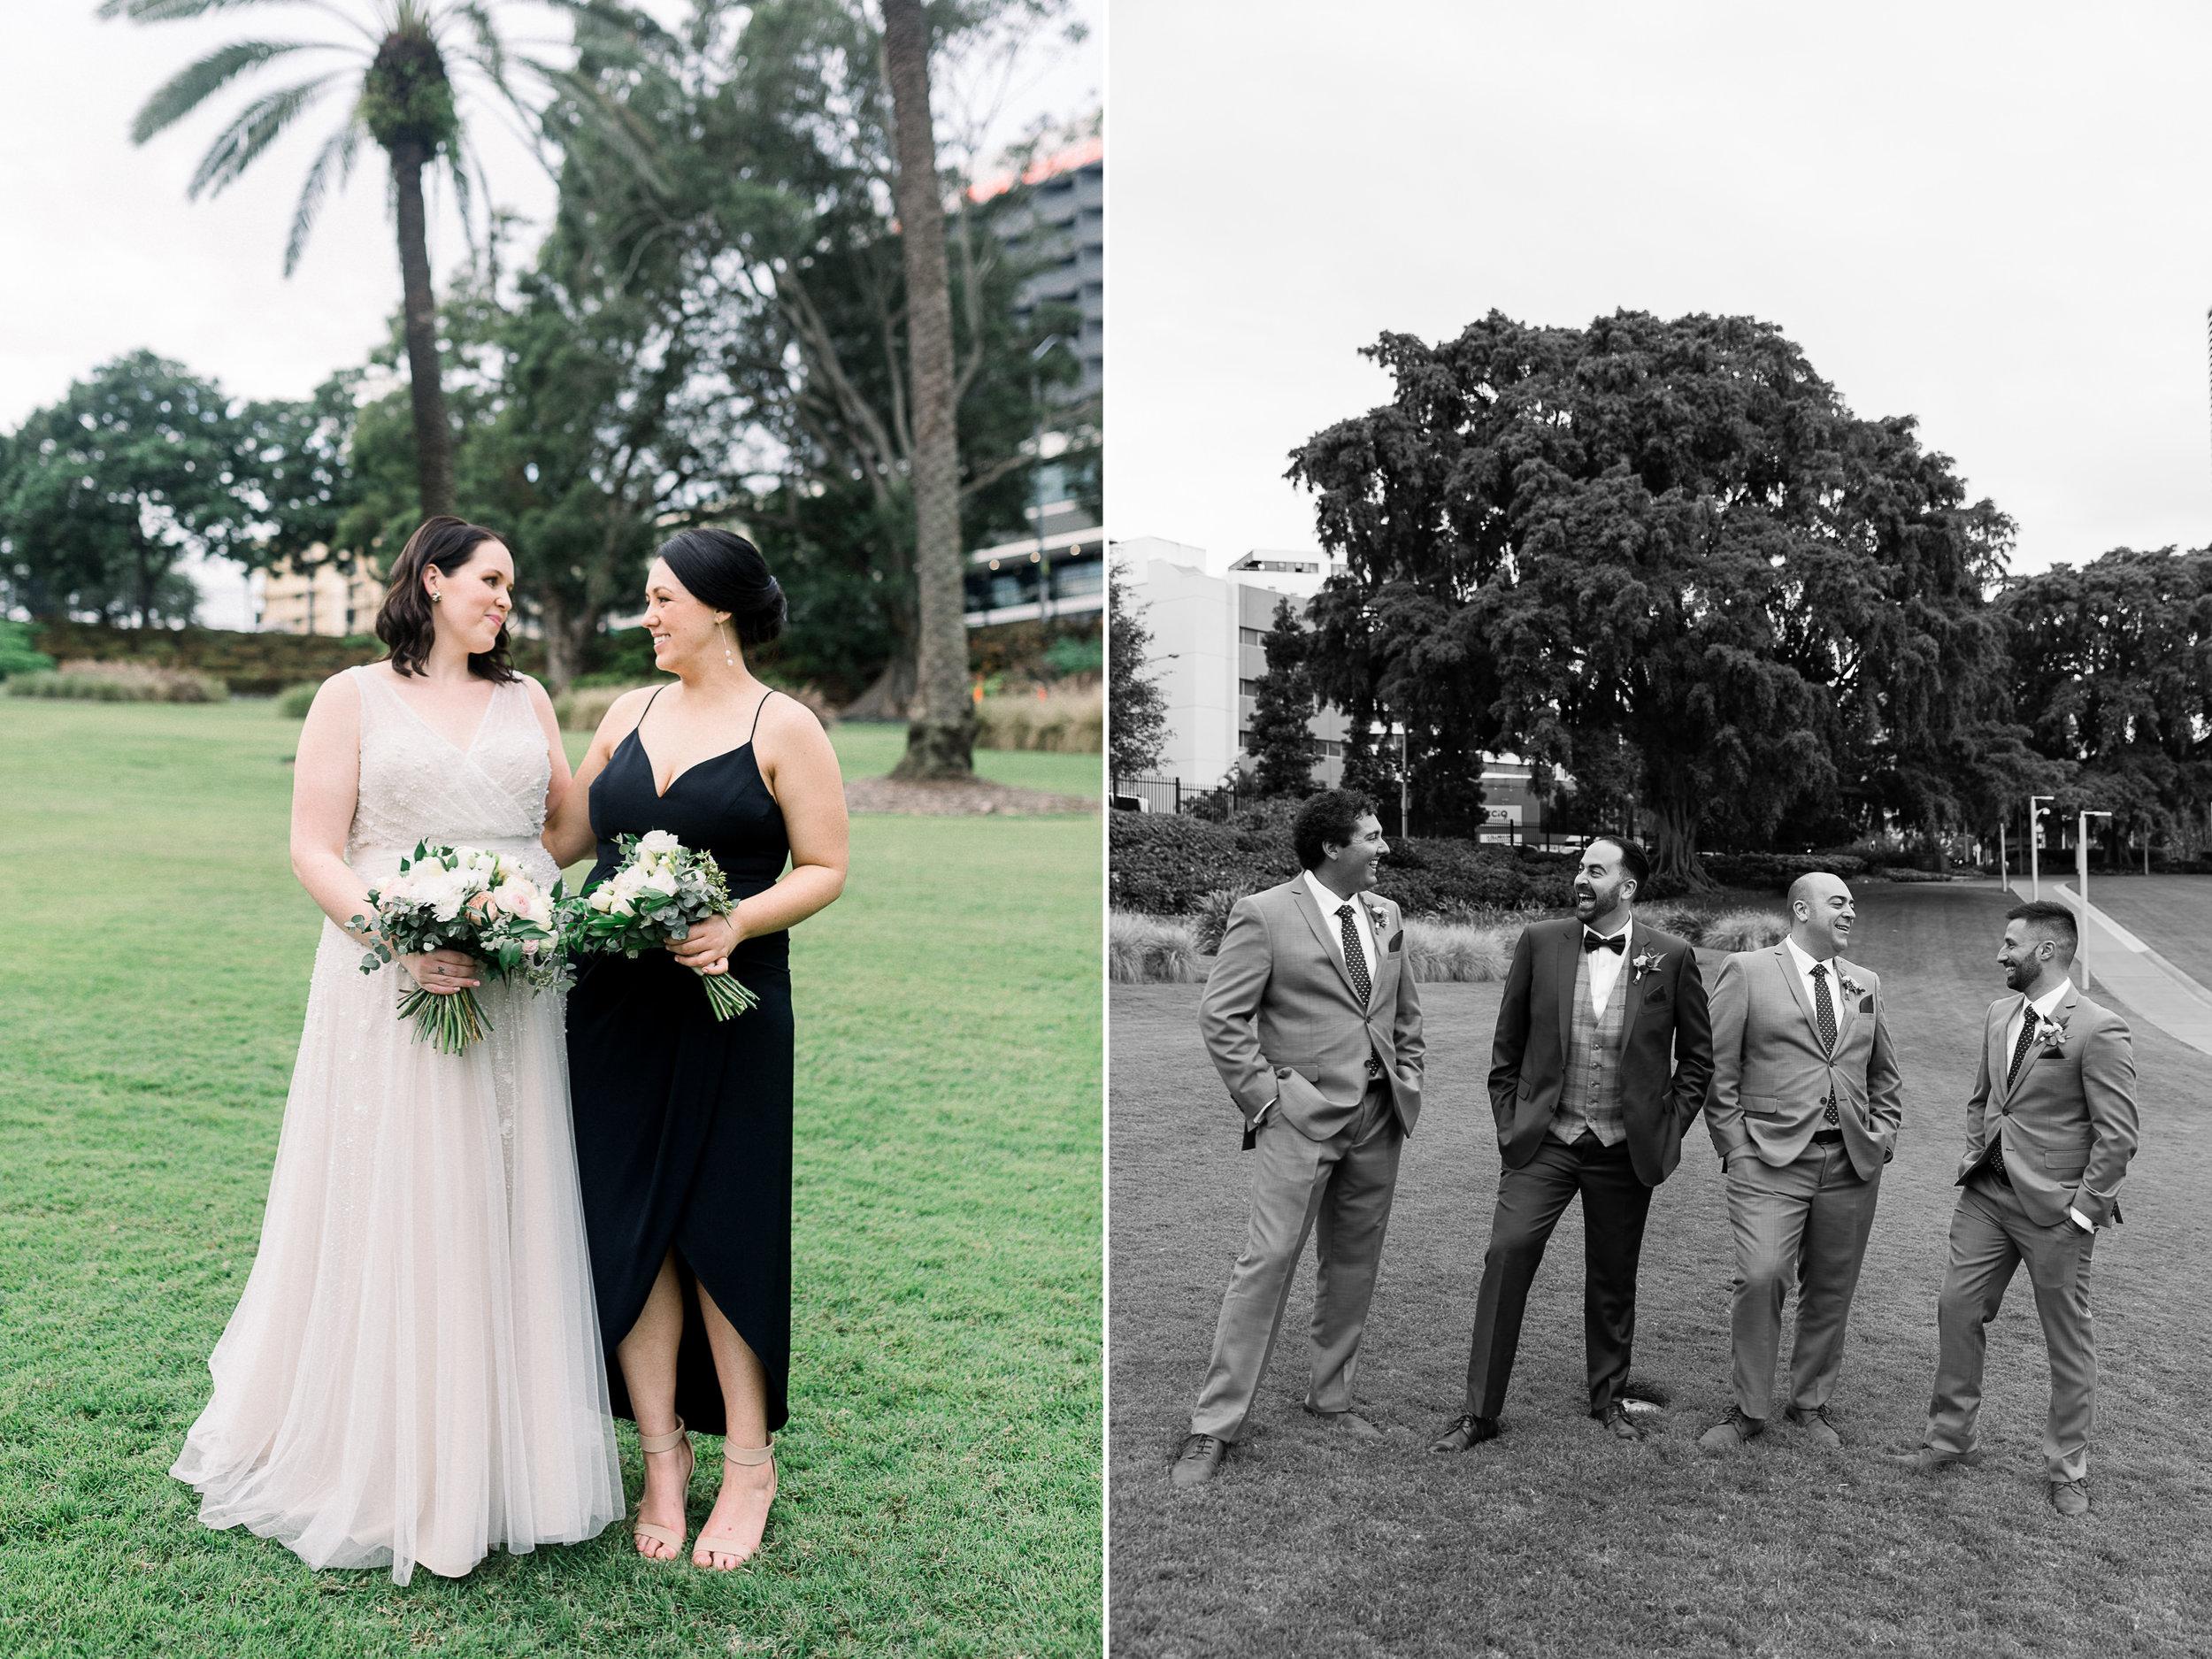 brisbane-city-wedding-romantic-bridal-photos-roma-st-7.jpg